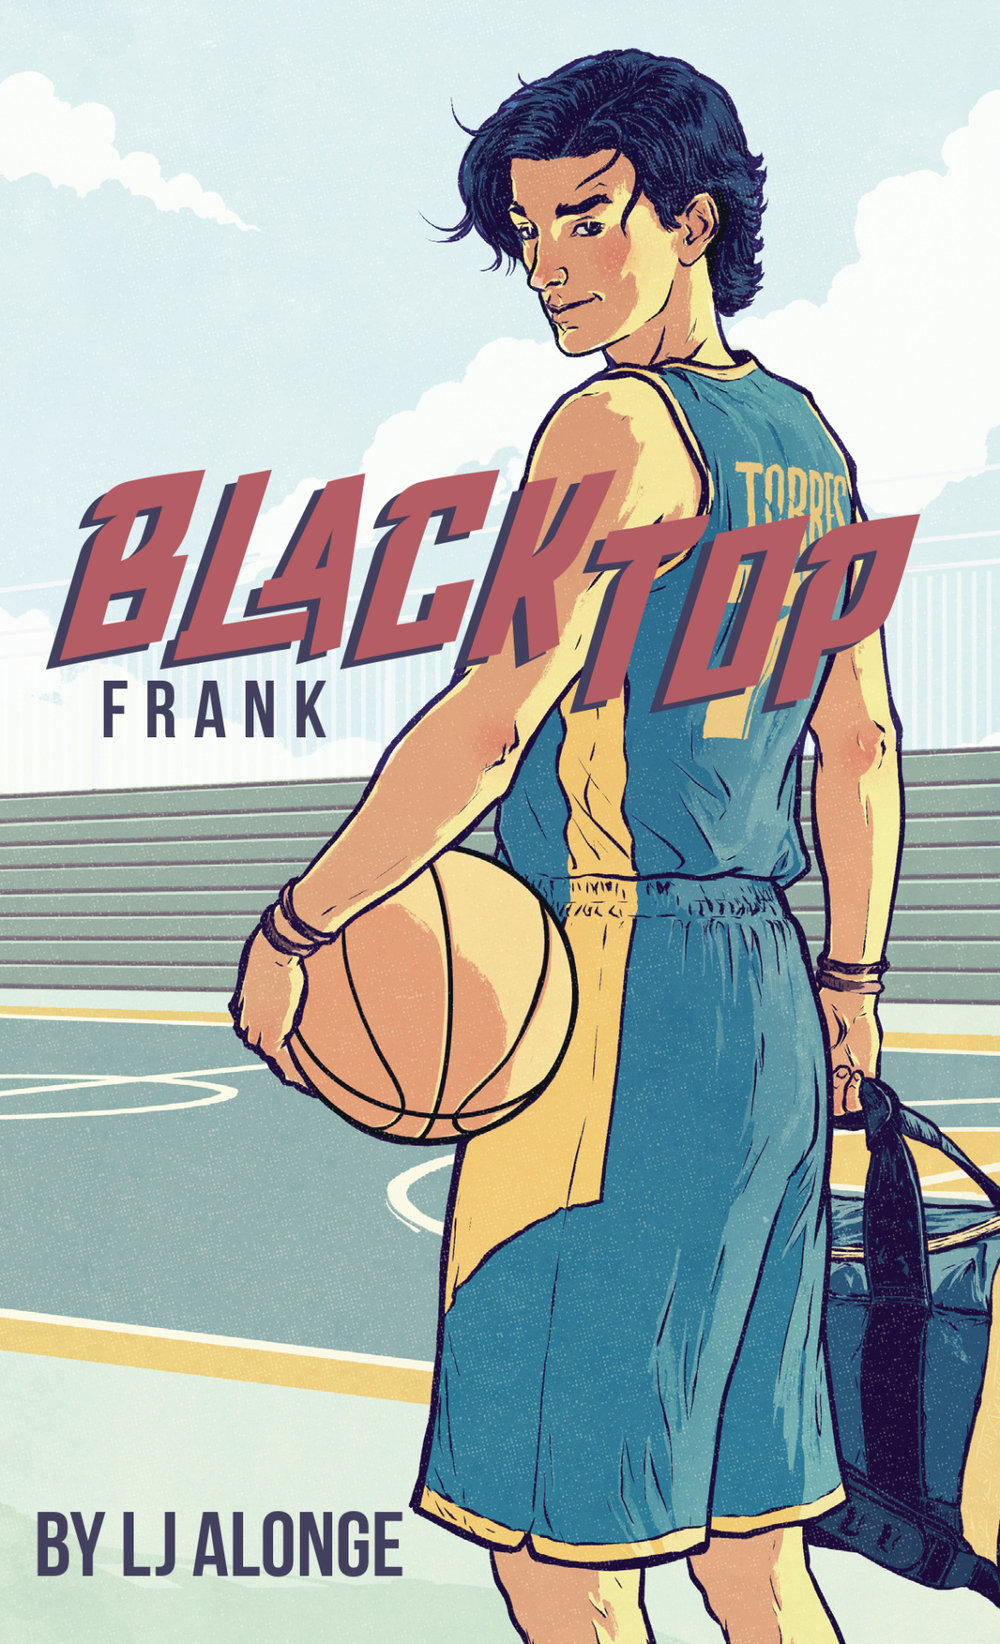 Blacktop: Frank